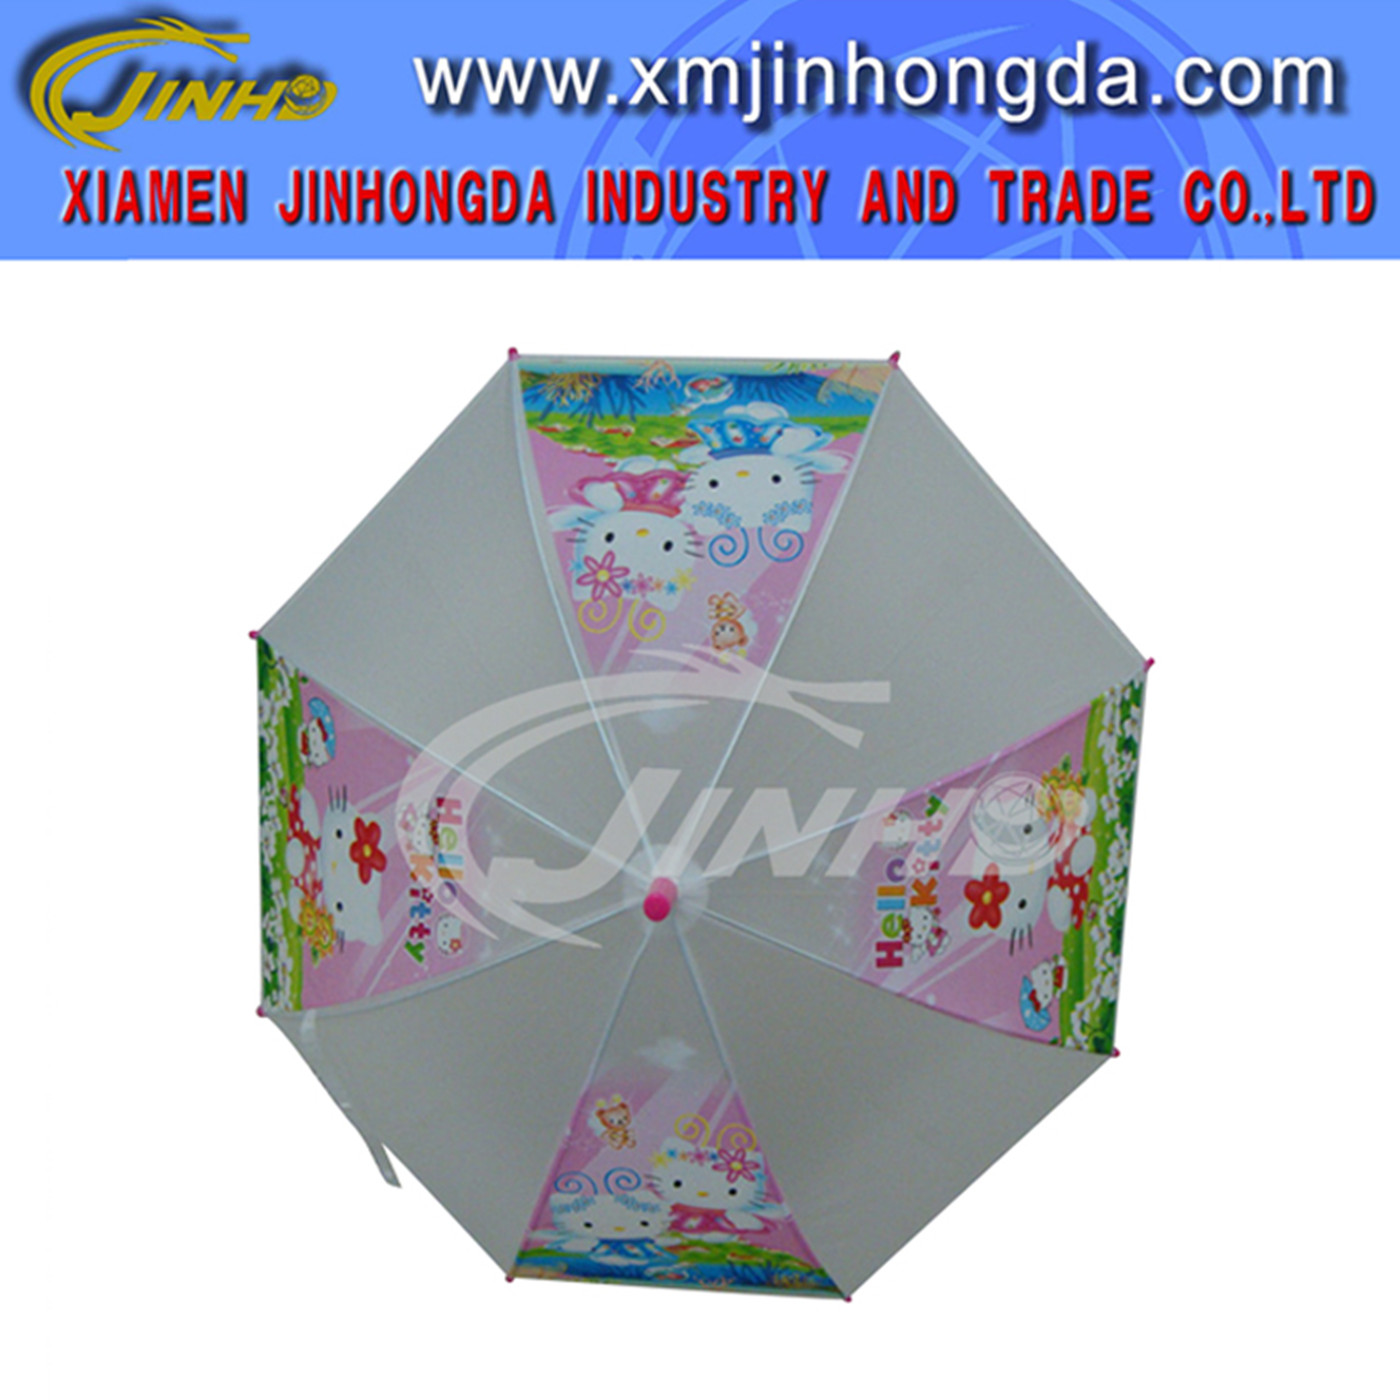 Baby Poe Umbrella in Stock - JHDC0024